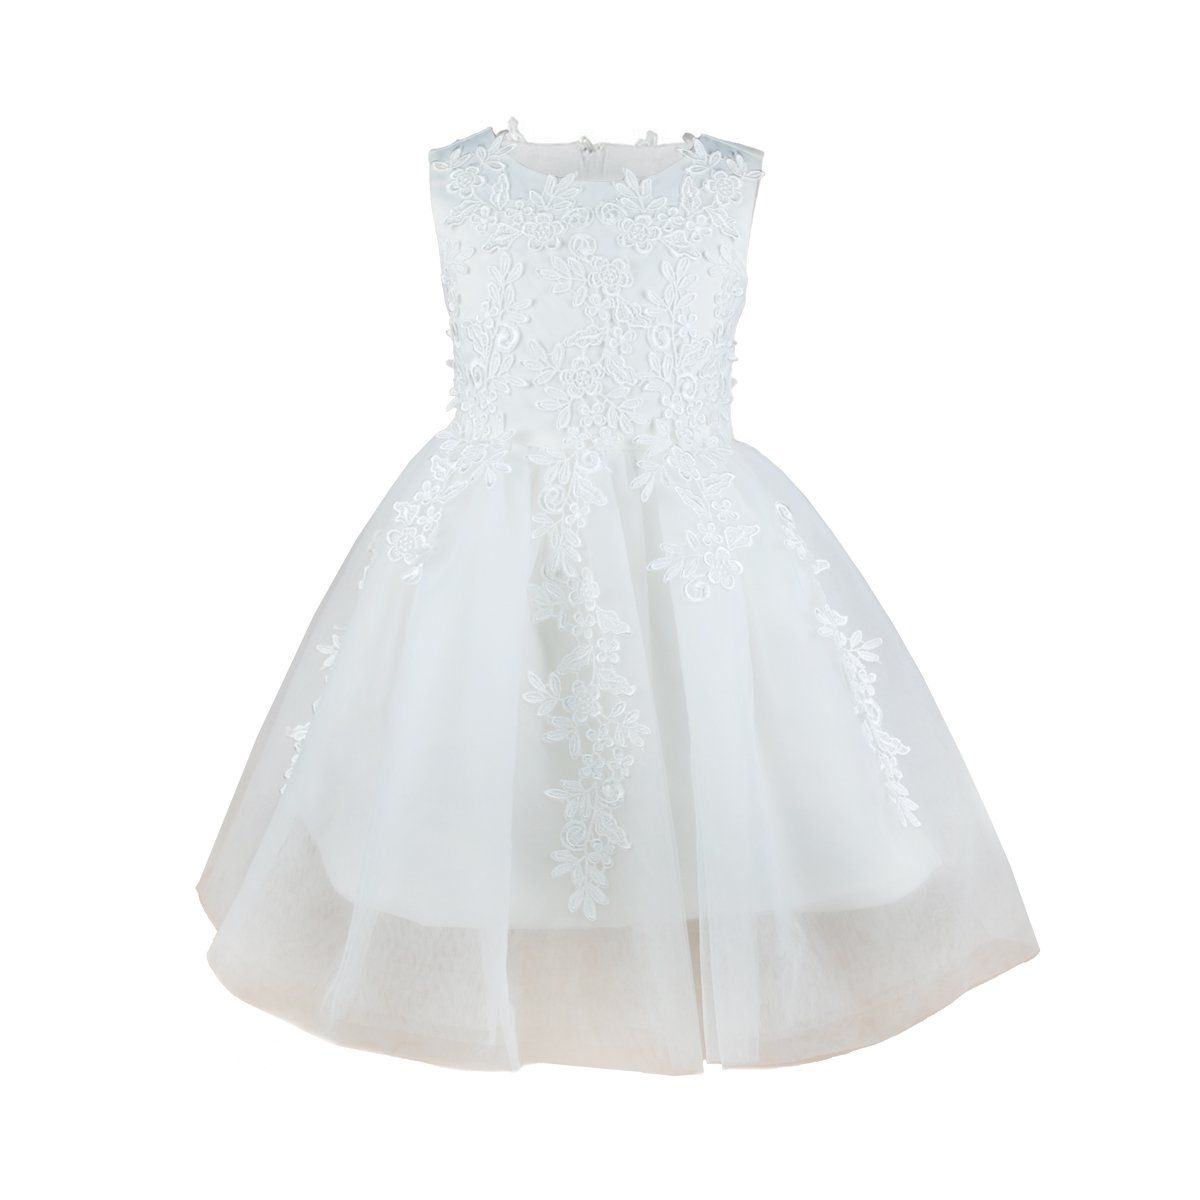 Girls Princess Flower Lace Dress Wedding Party White Gown Bridesmaid Tulle Skirt 3t White Em Wedding Dresses Celebrity Wedding Dresses Wedding Dresses Blush [ 1200 x 1200 Pixel ]